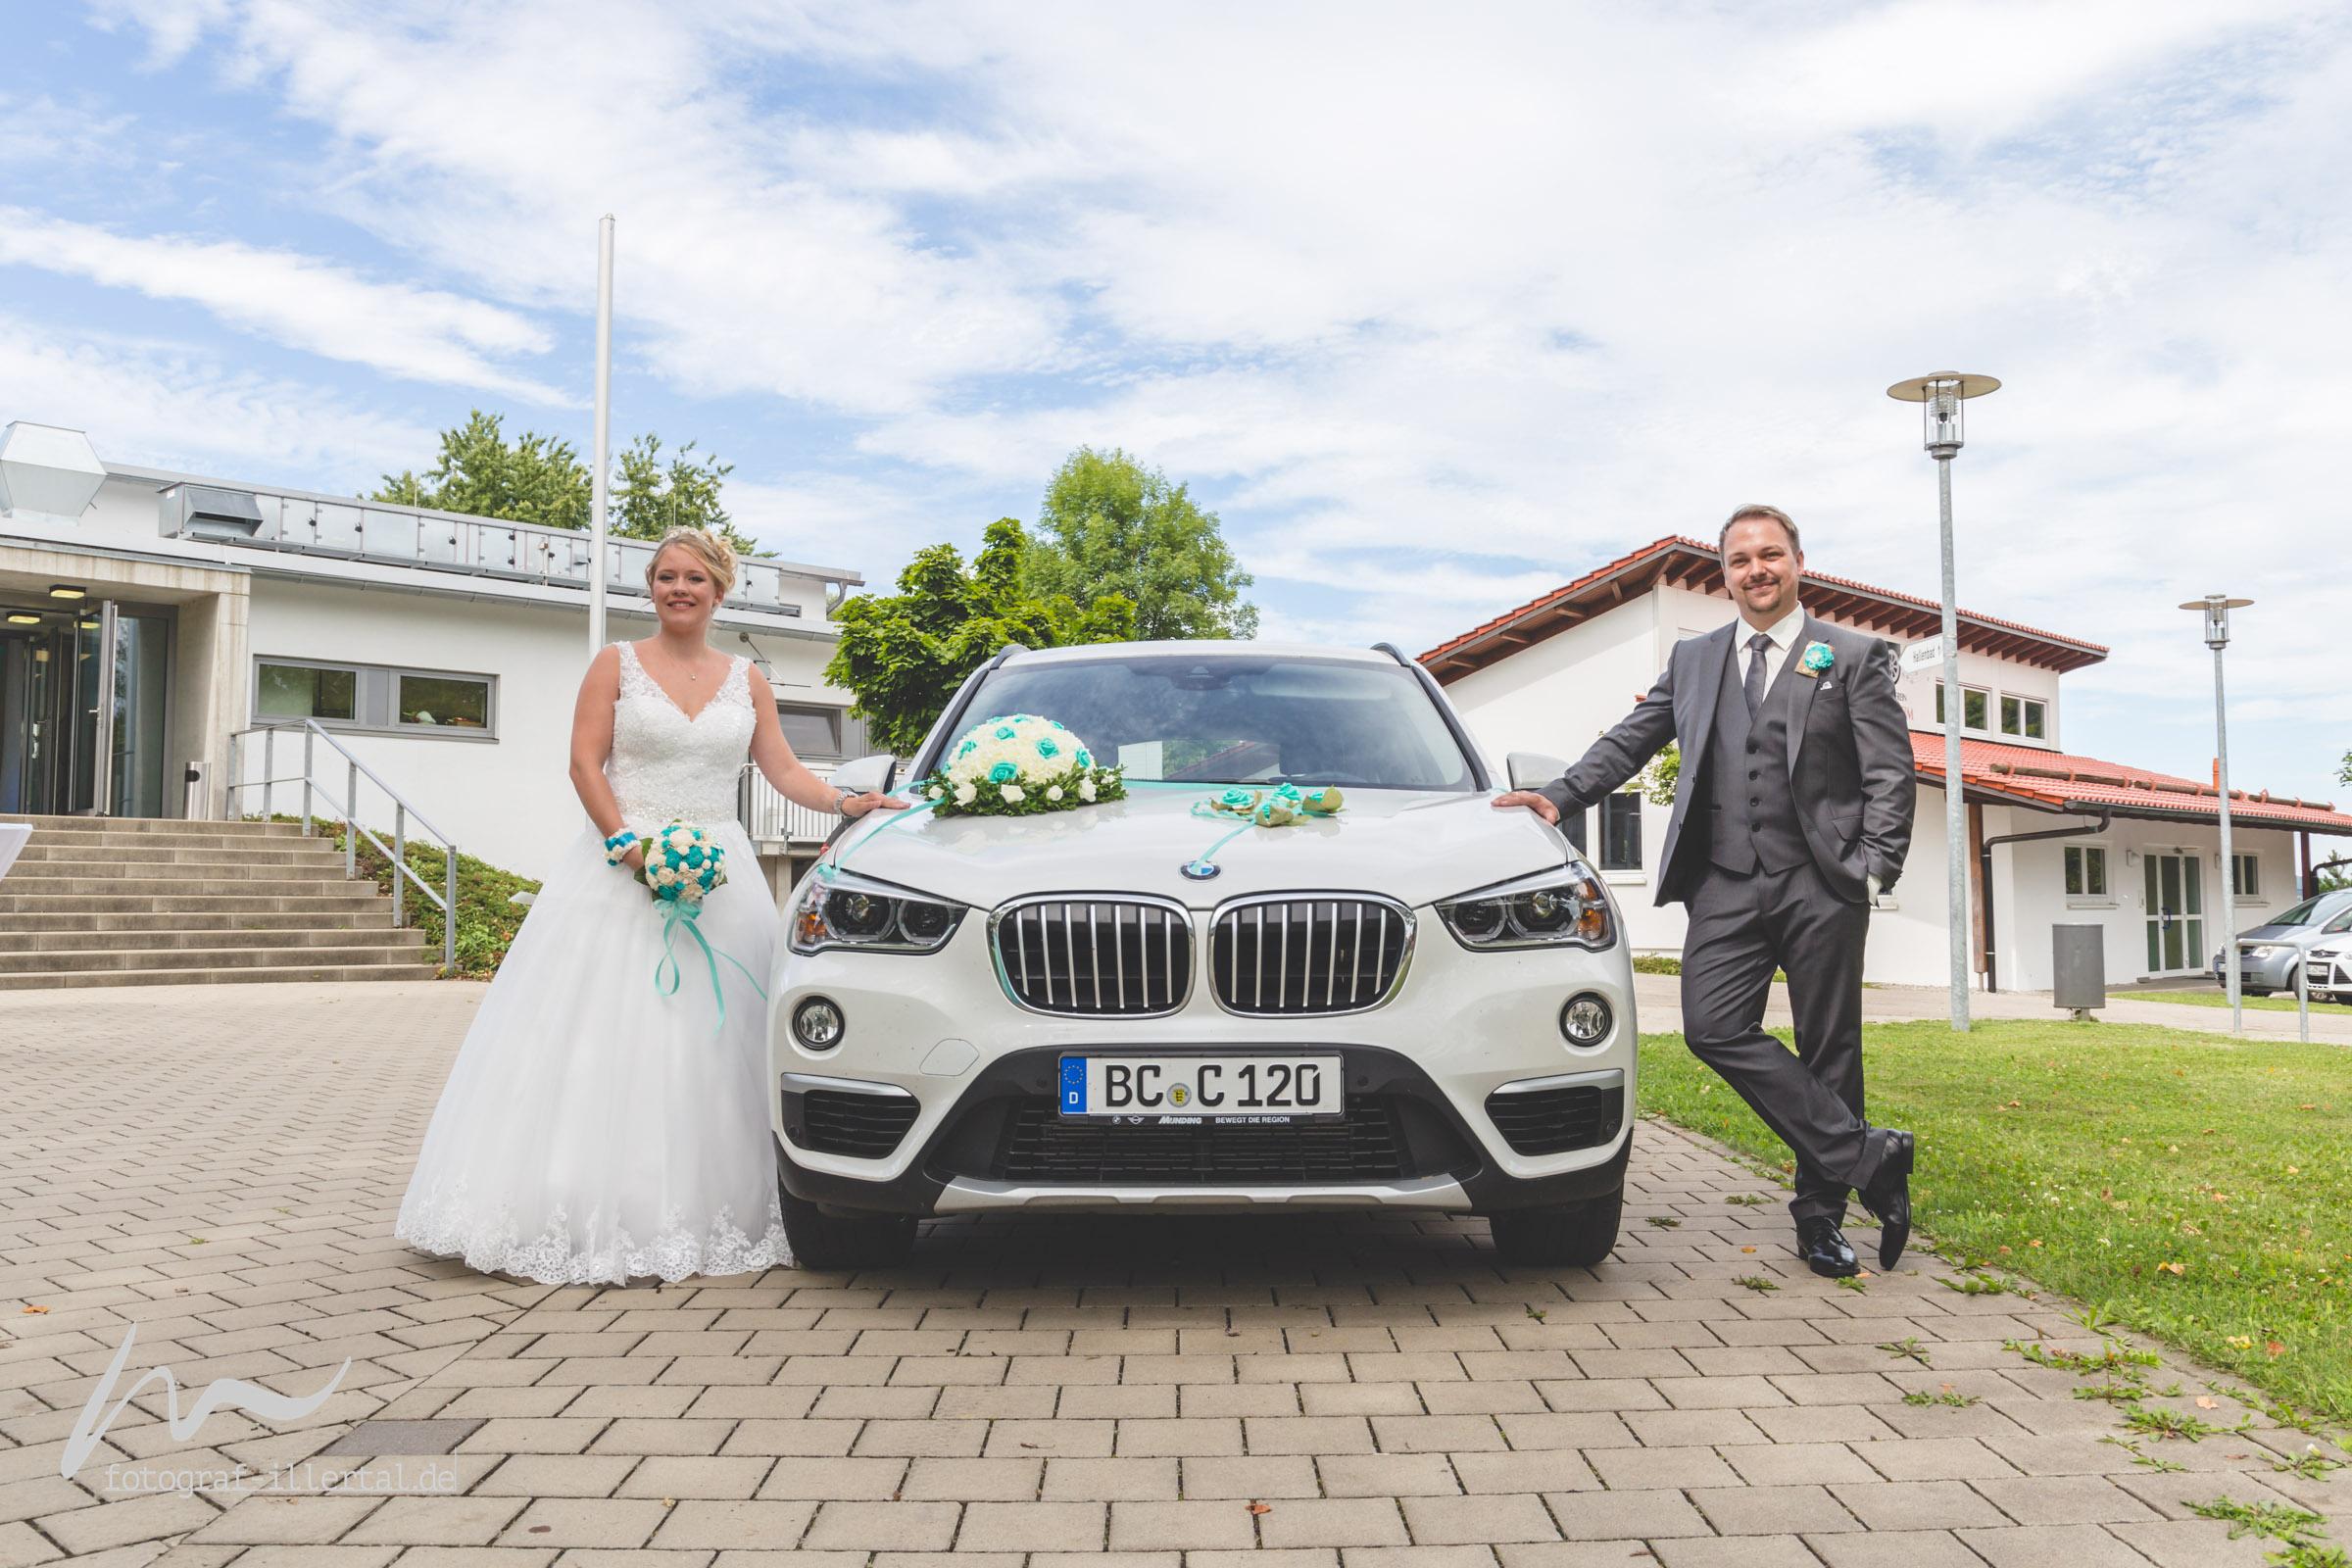 Fotograf Illertal-Christian Miller-Hochzeitsfotografie-_MG_6153